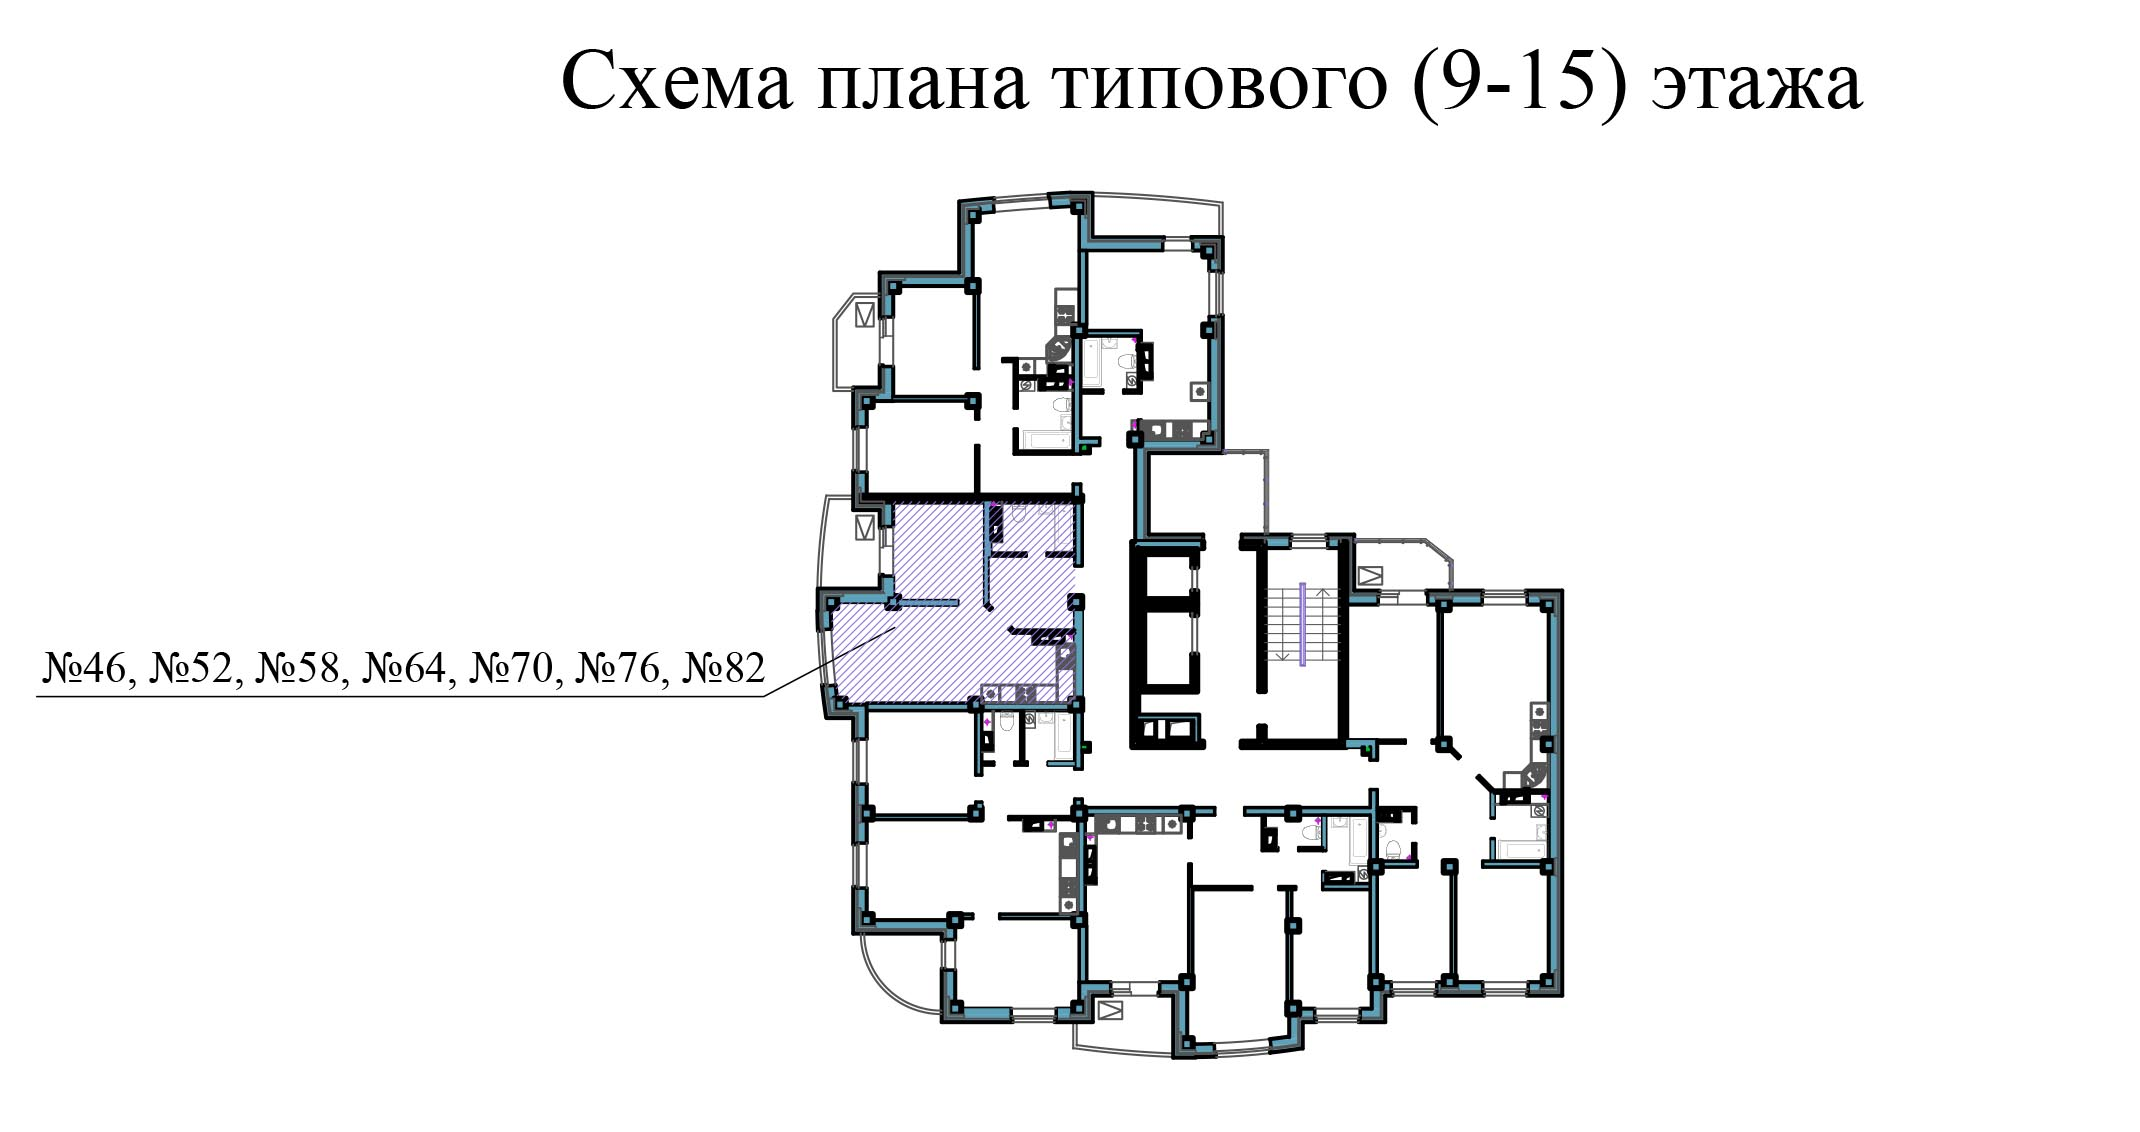 Однокомнатная квартира - ул.Балтийская, д. 1а, кв. 46,52, 58, 64, 70, 76, 82